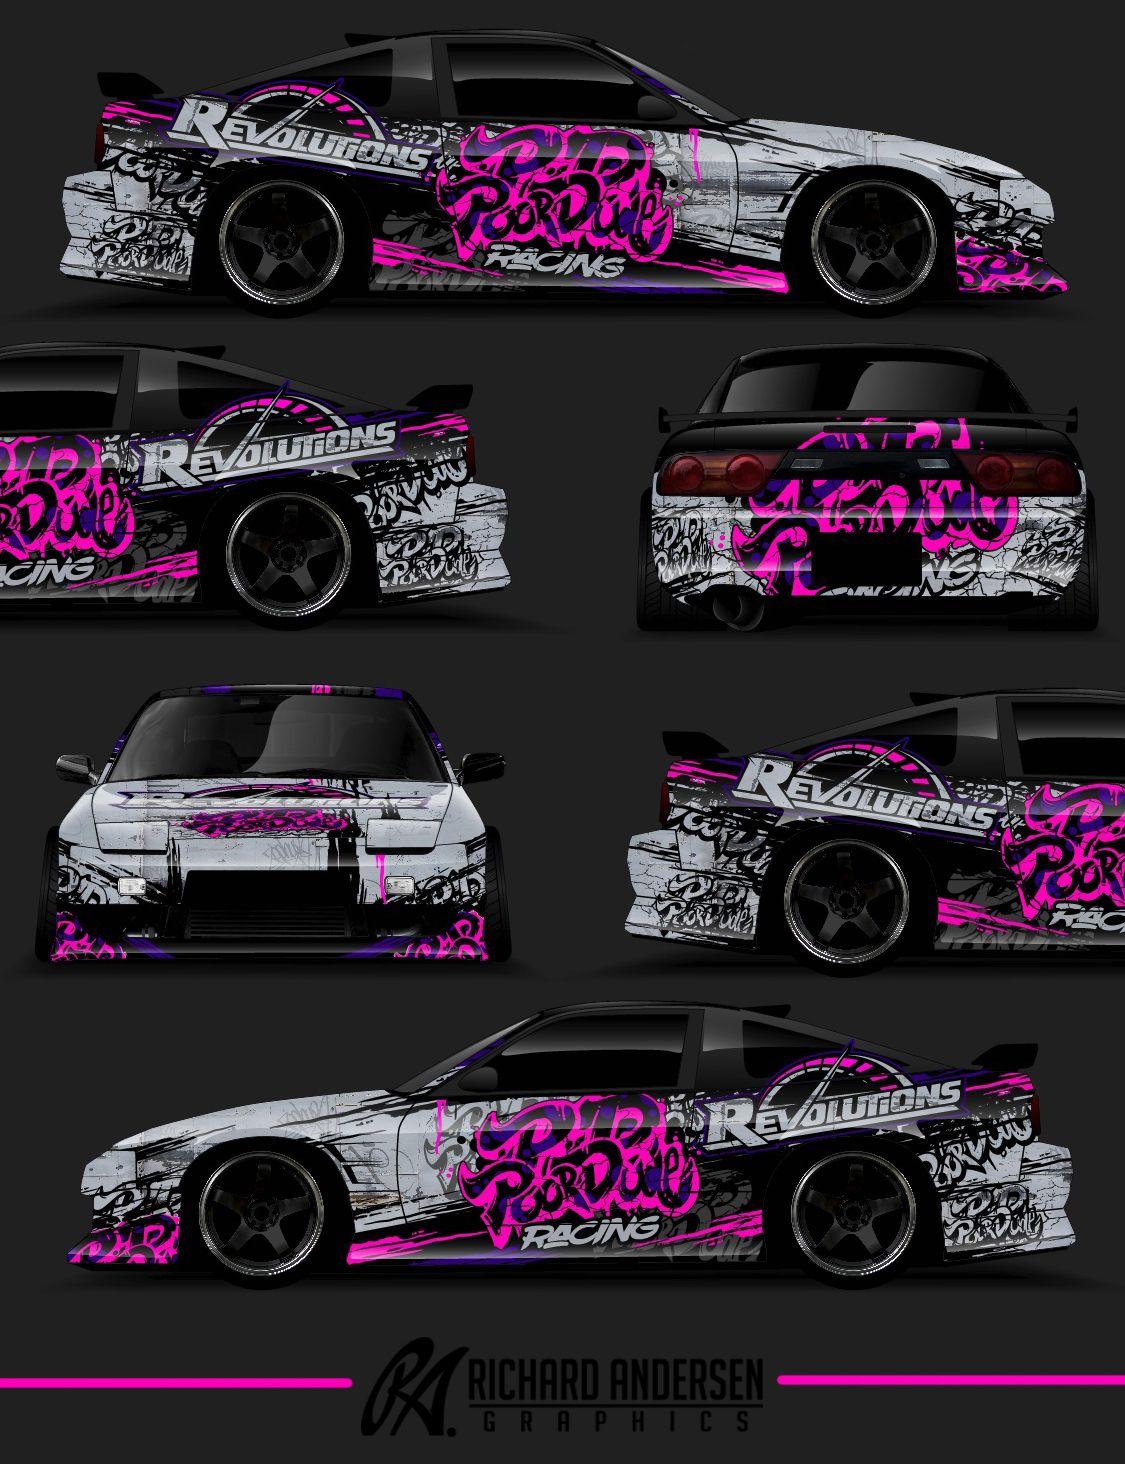 Car club sticker designs - Wrap Design By Richard Andersen Https Ragraphics Carbonmade Com